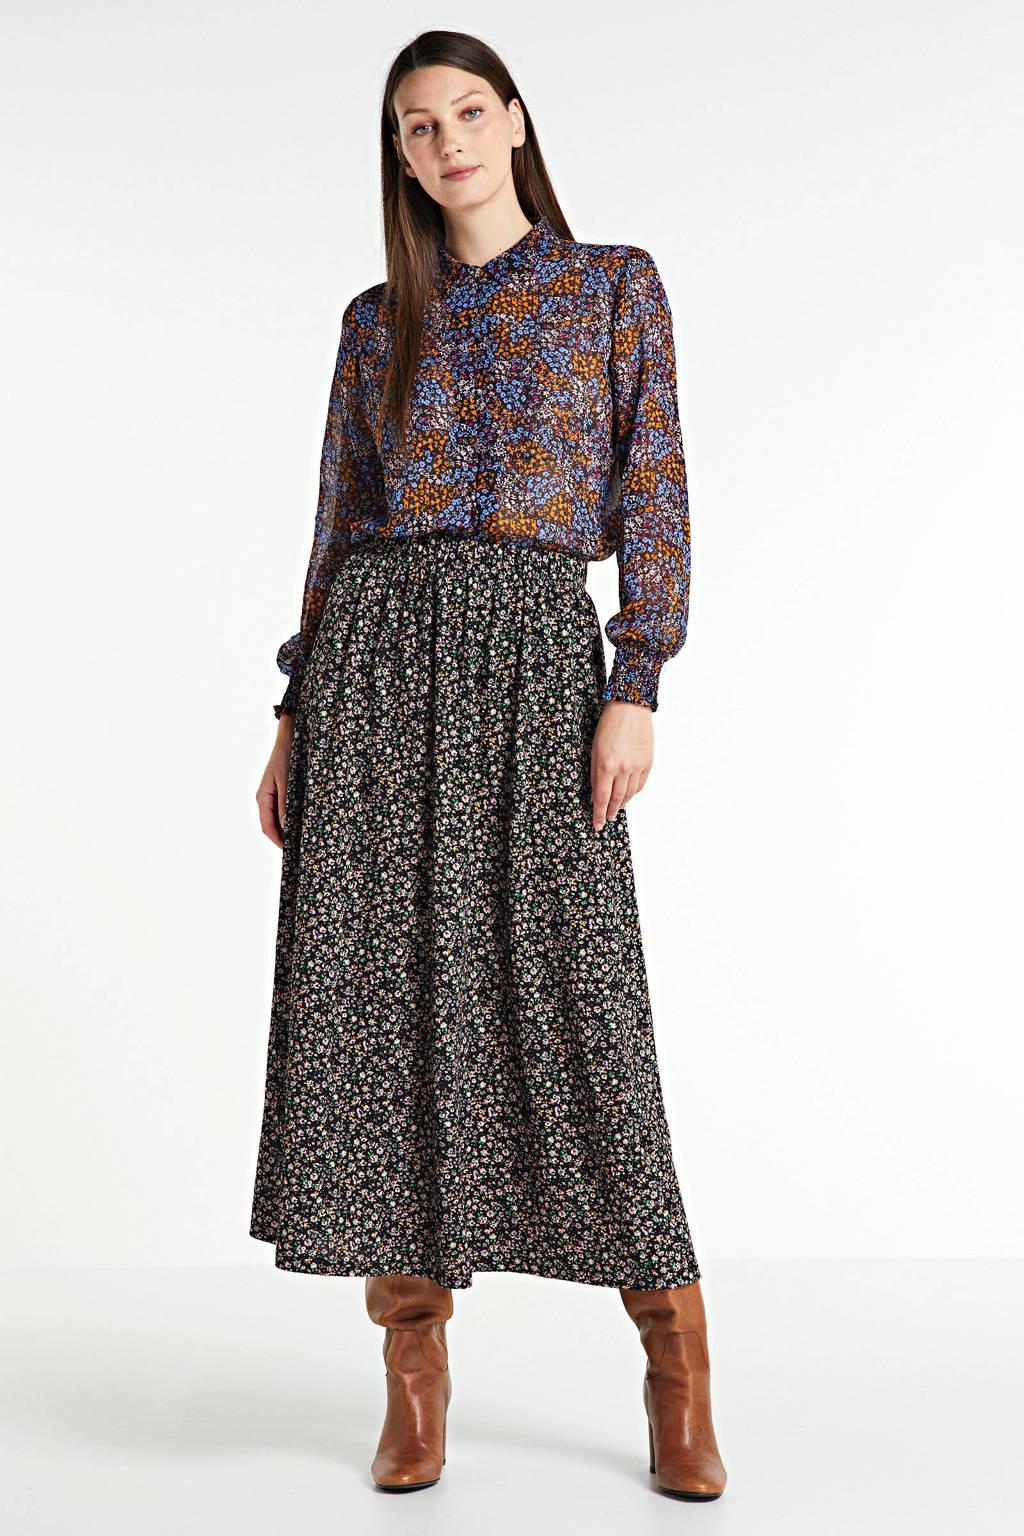 Modström gebloemde blouse Flame van gerecycled polyester blauw/multi, Blauw/multi